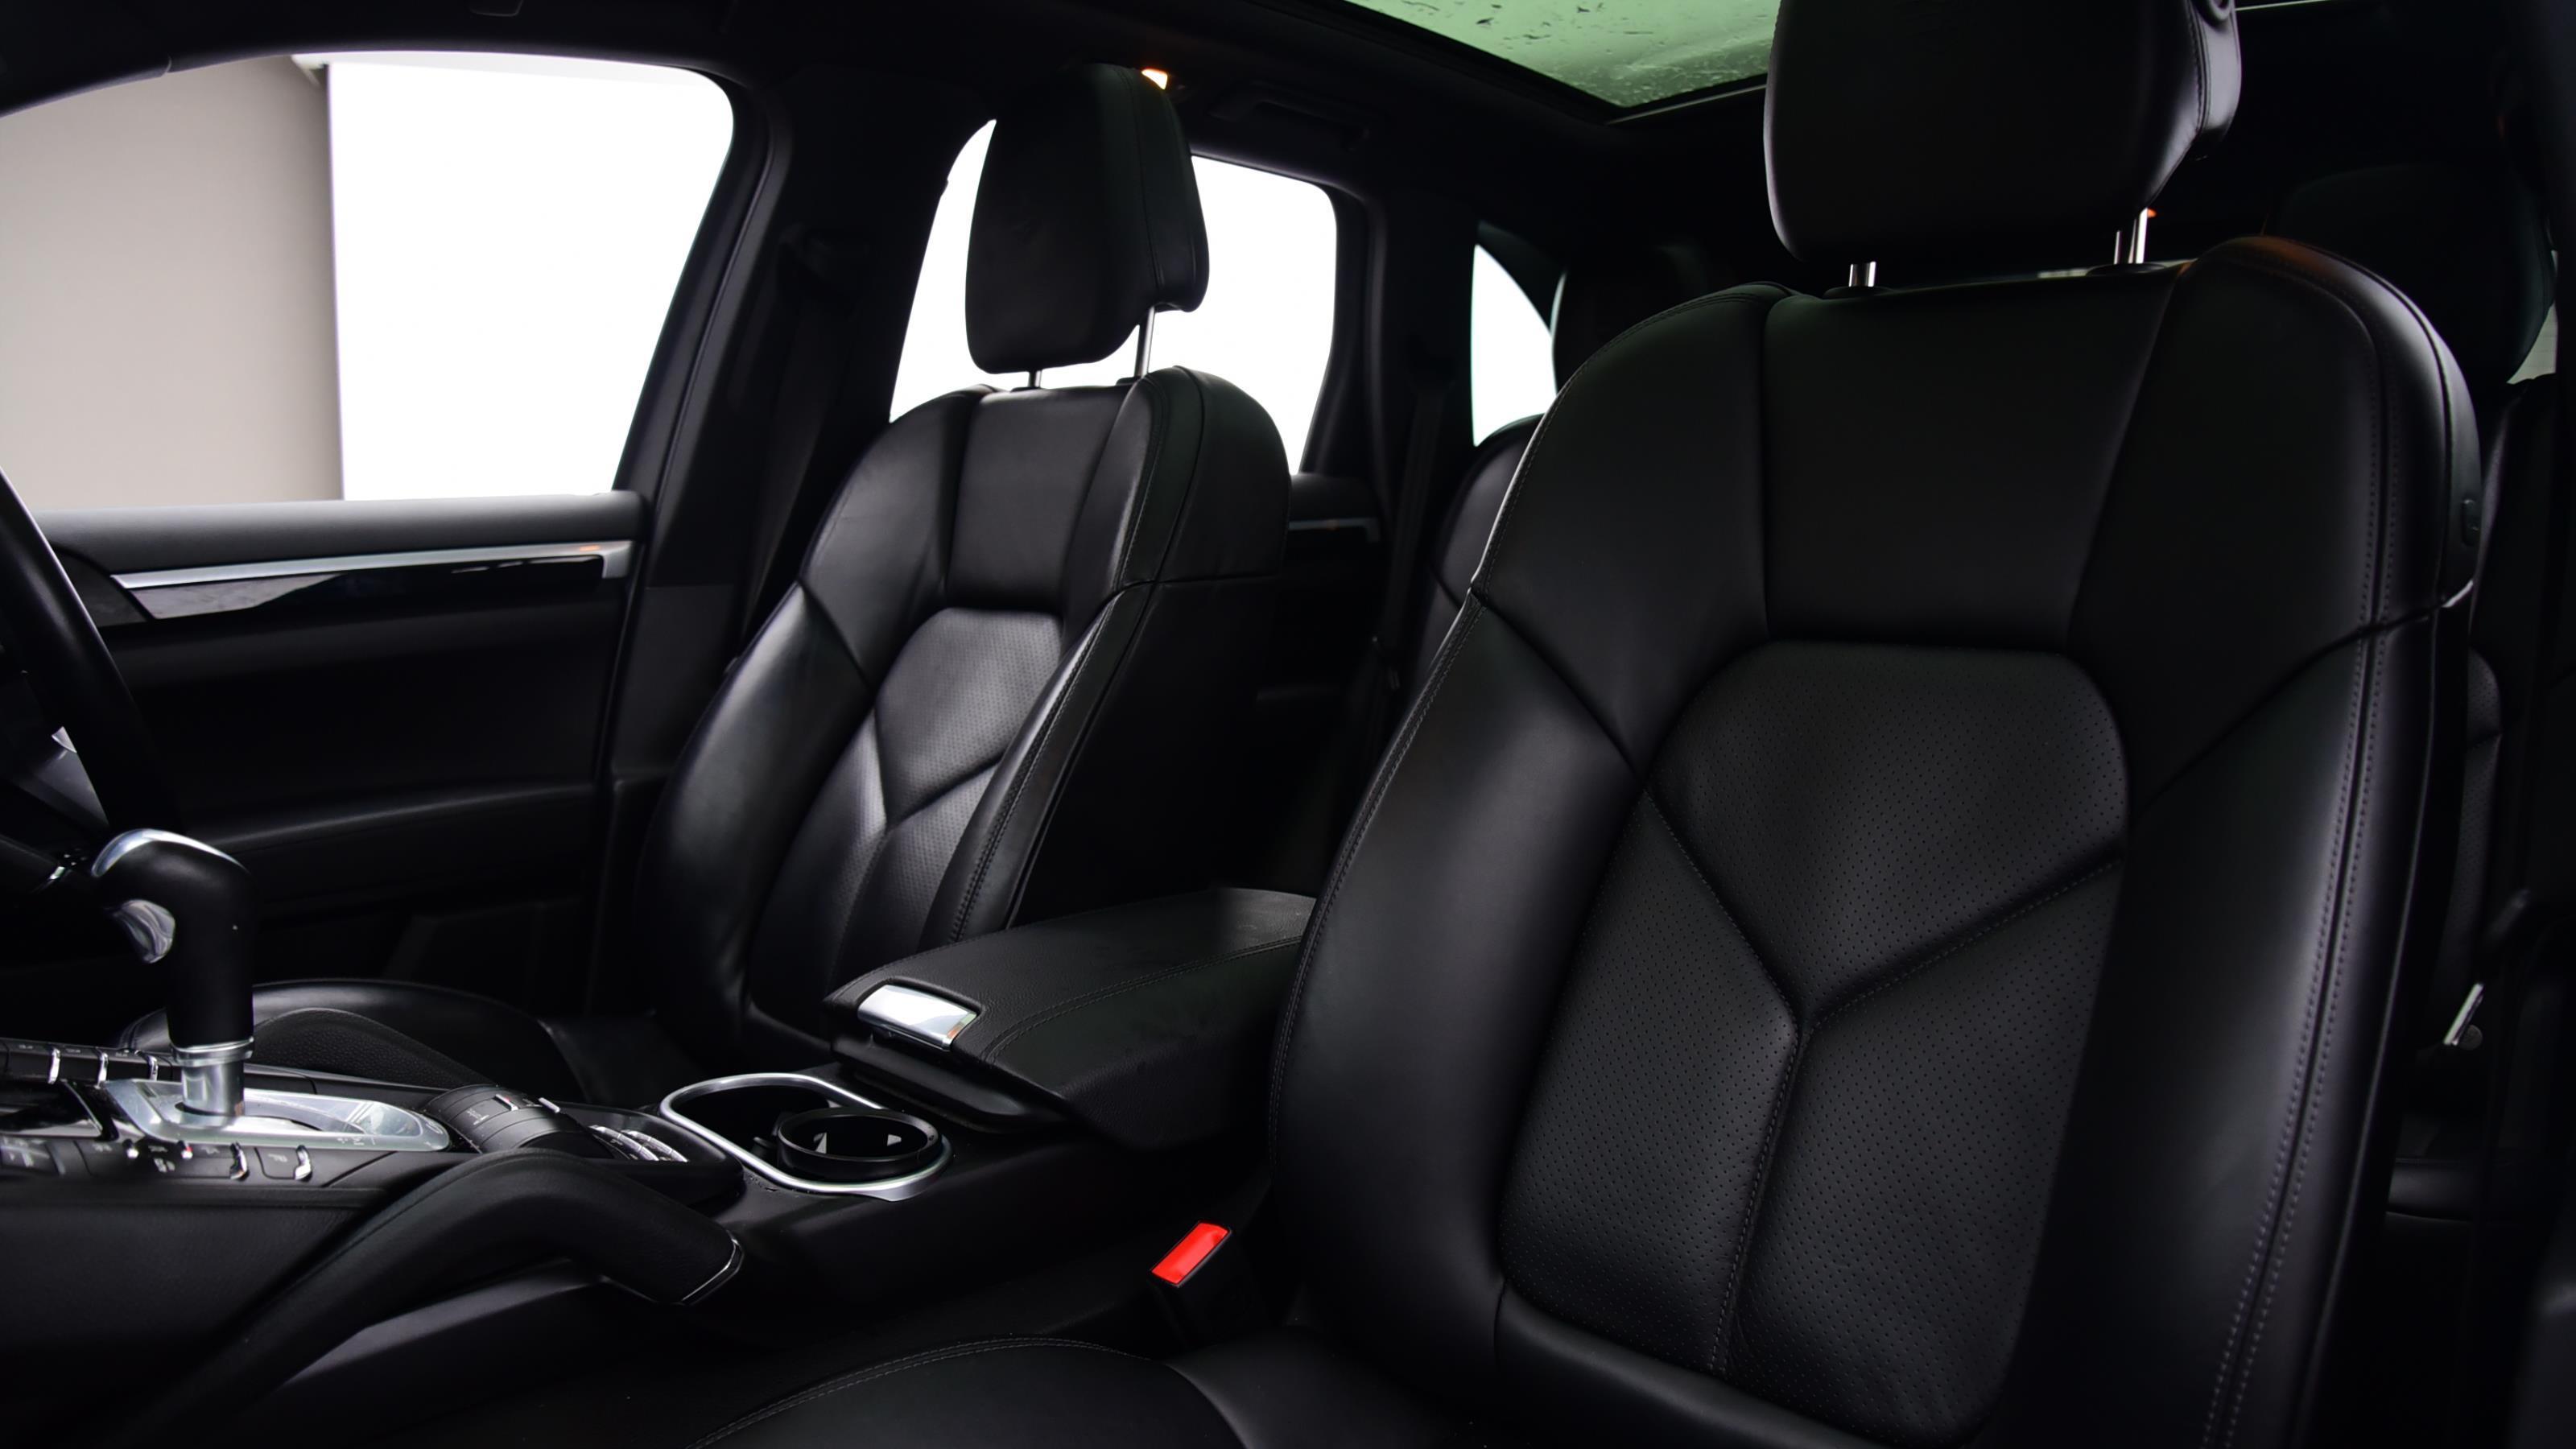 Used 2016 Porsche CAYENNE S Platinum Edition E-Hybrid 5dr Tiptronic S SILVER at Saxton4x4